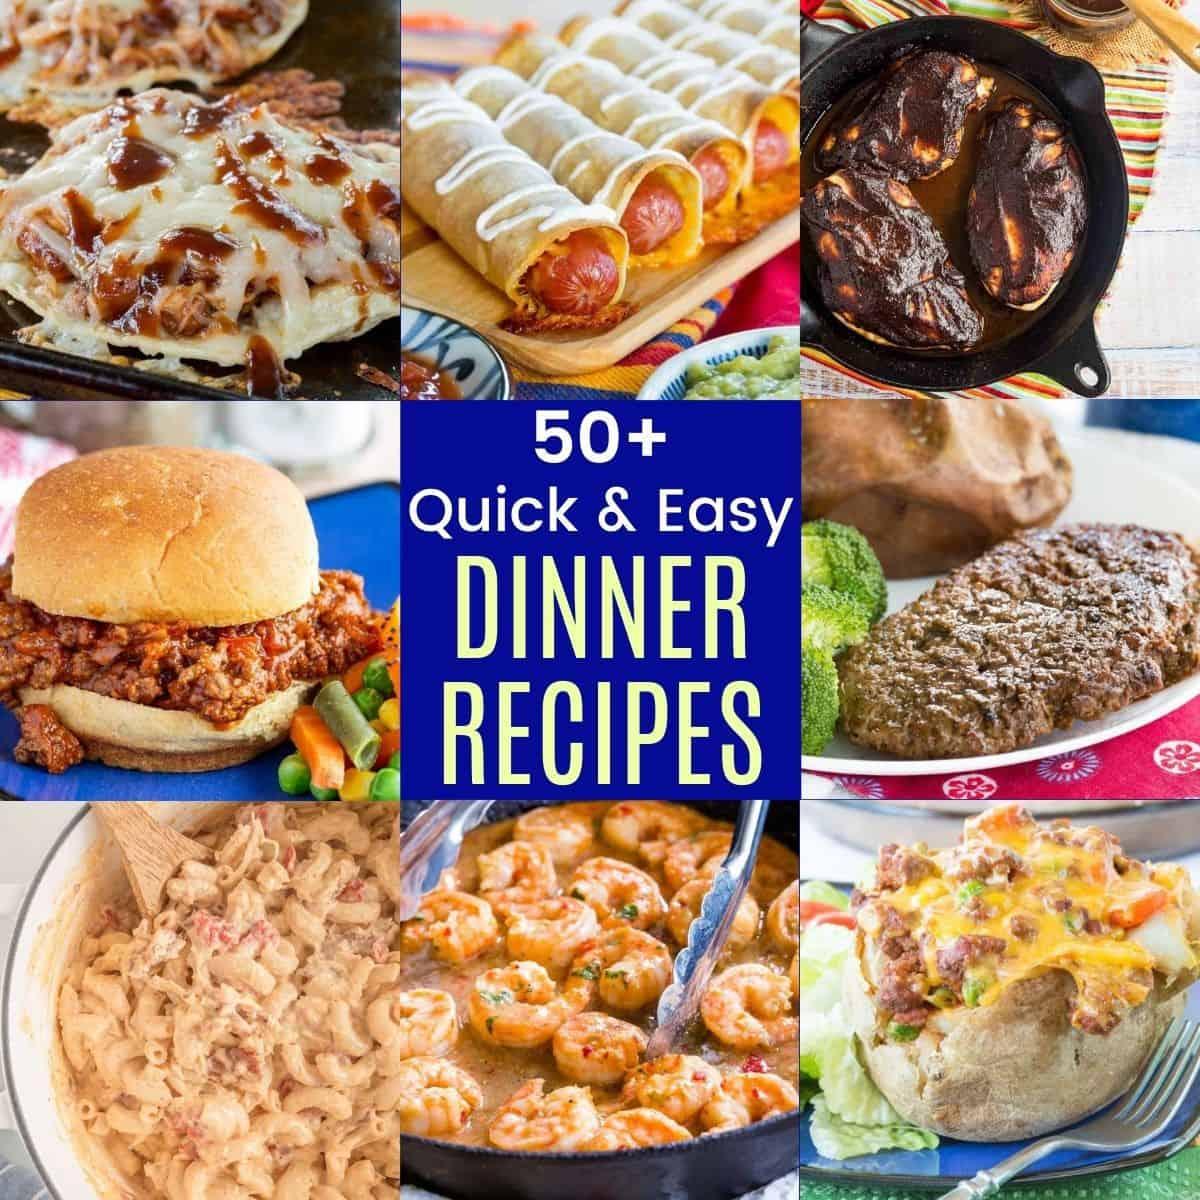 & recipes quick easy Quick Spa,